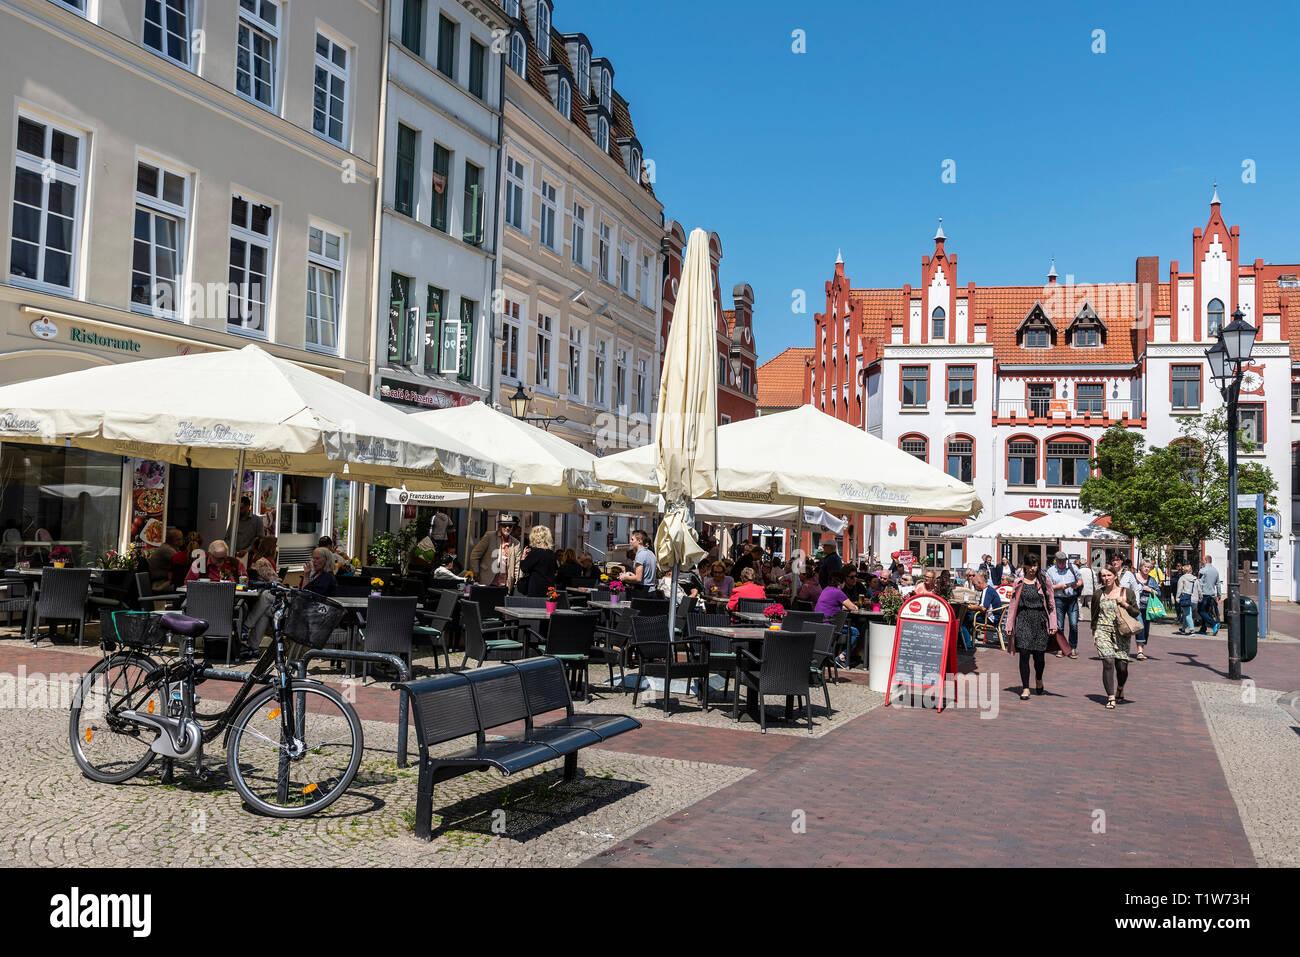 restaurants, market place, Wismar, Mecklenburg-Western Pomerania, Germany - Stock Image